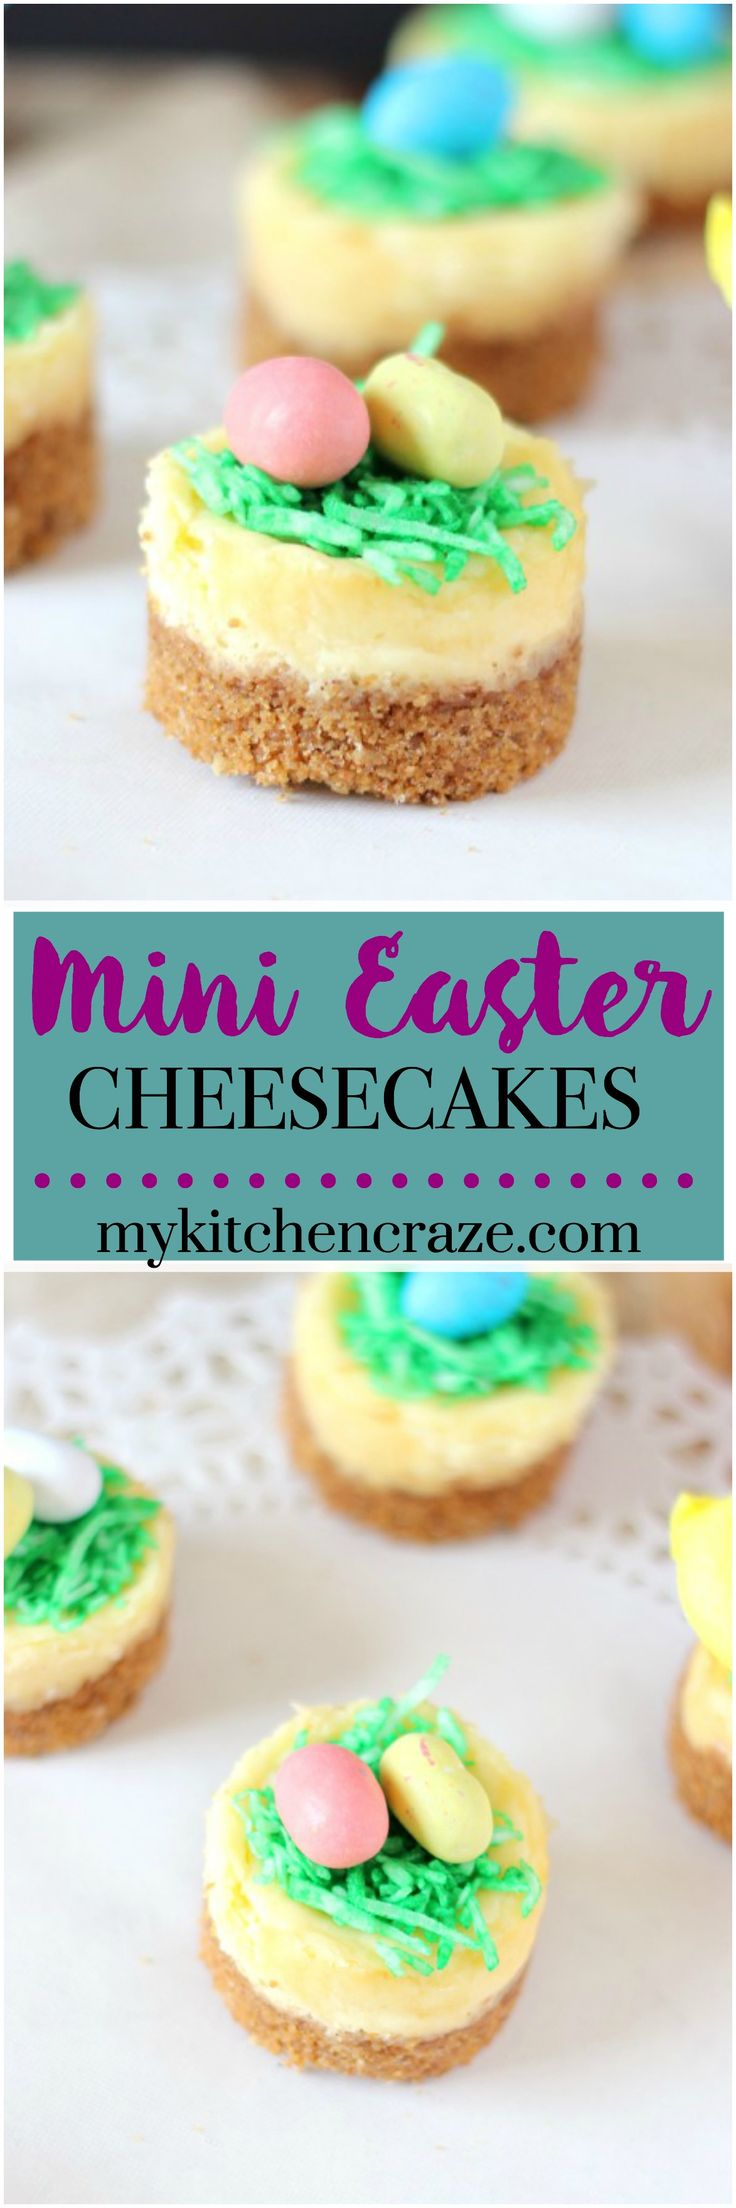 Mini Easter Cheesecake ~ mykitchencraze@gmail.com